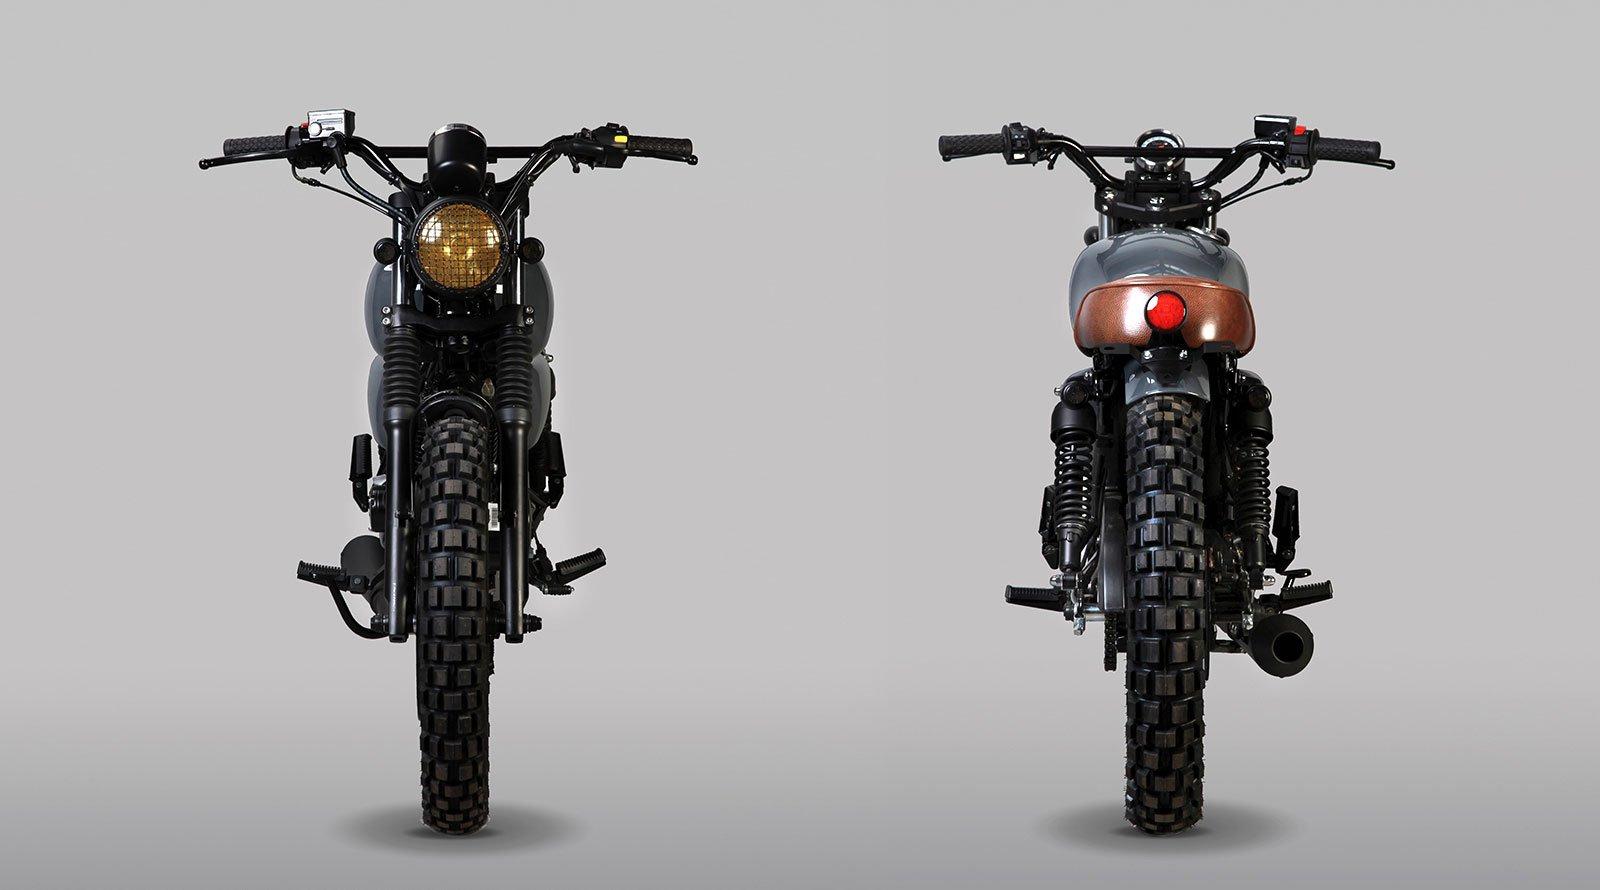 Mutt Motorcycle Hilts 125cc